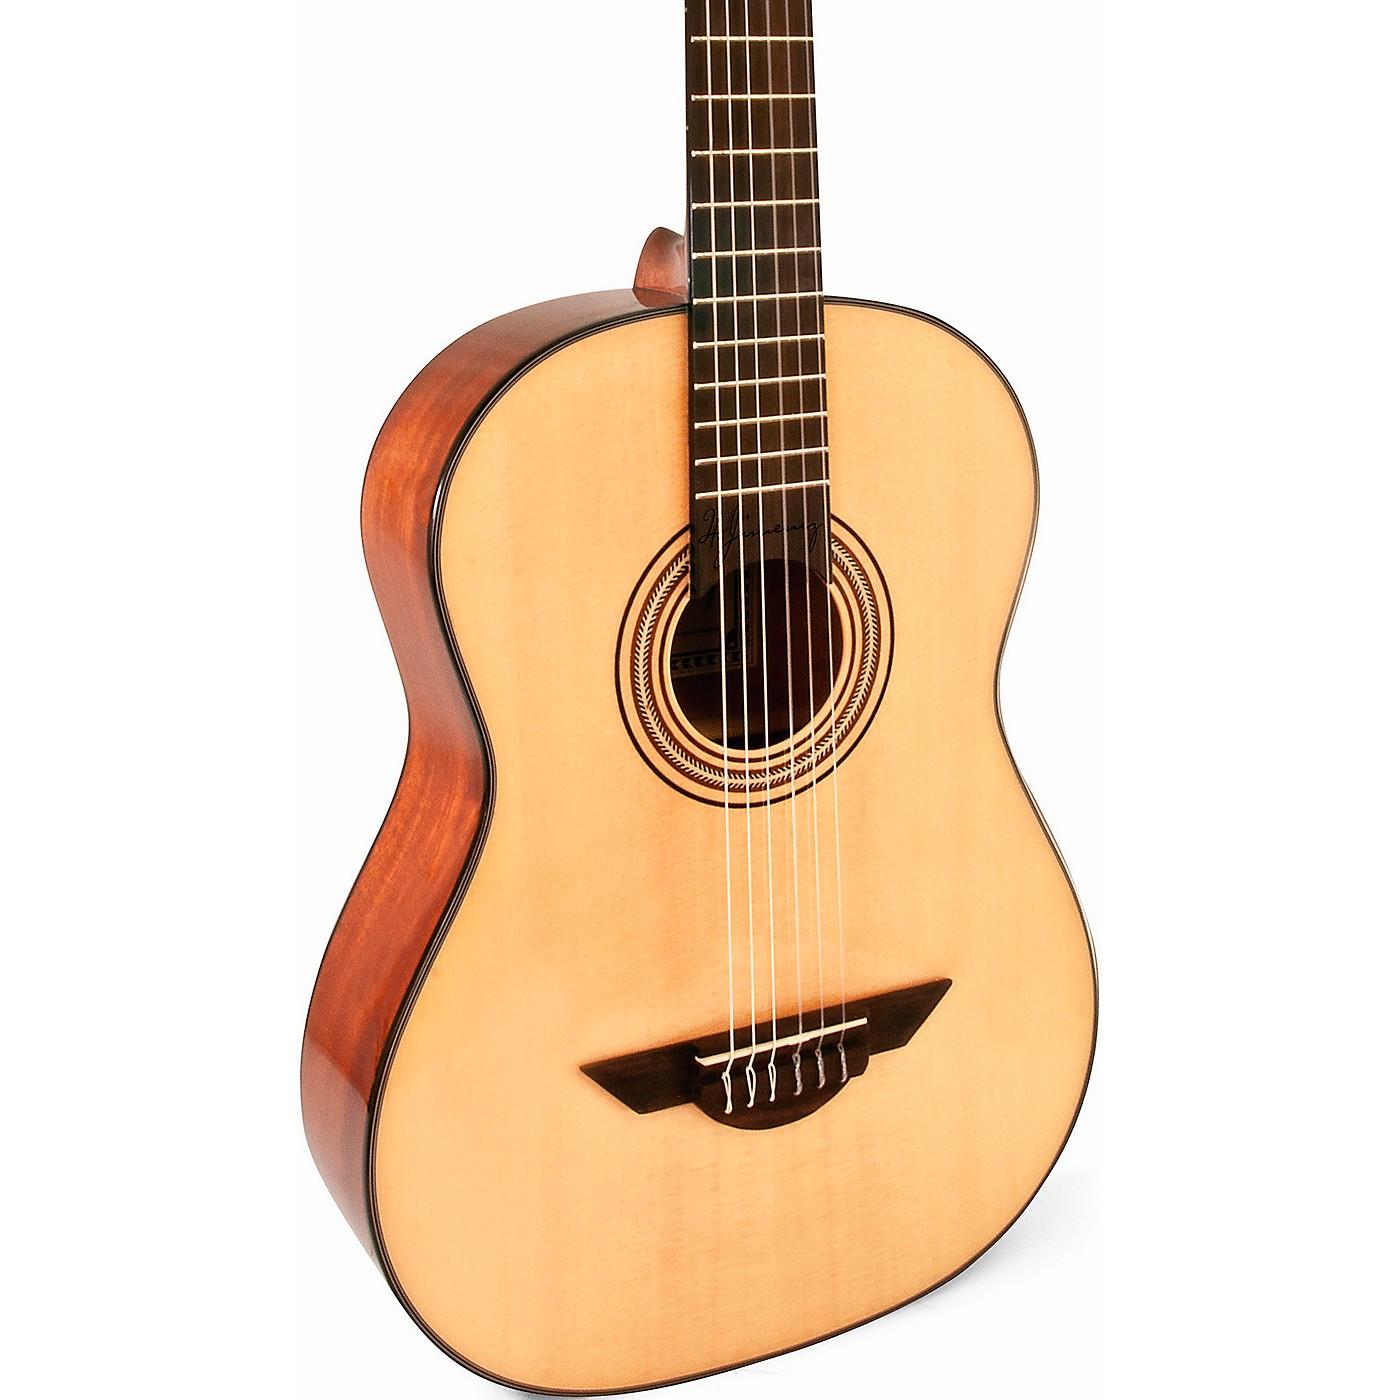 H. Jimenez LG Voz Fuerte Nylon-String with Spruce Top Acoustic Guitar thumbnail